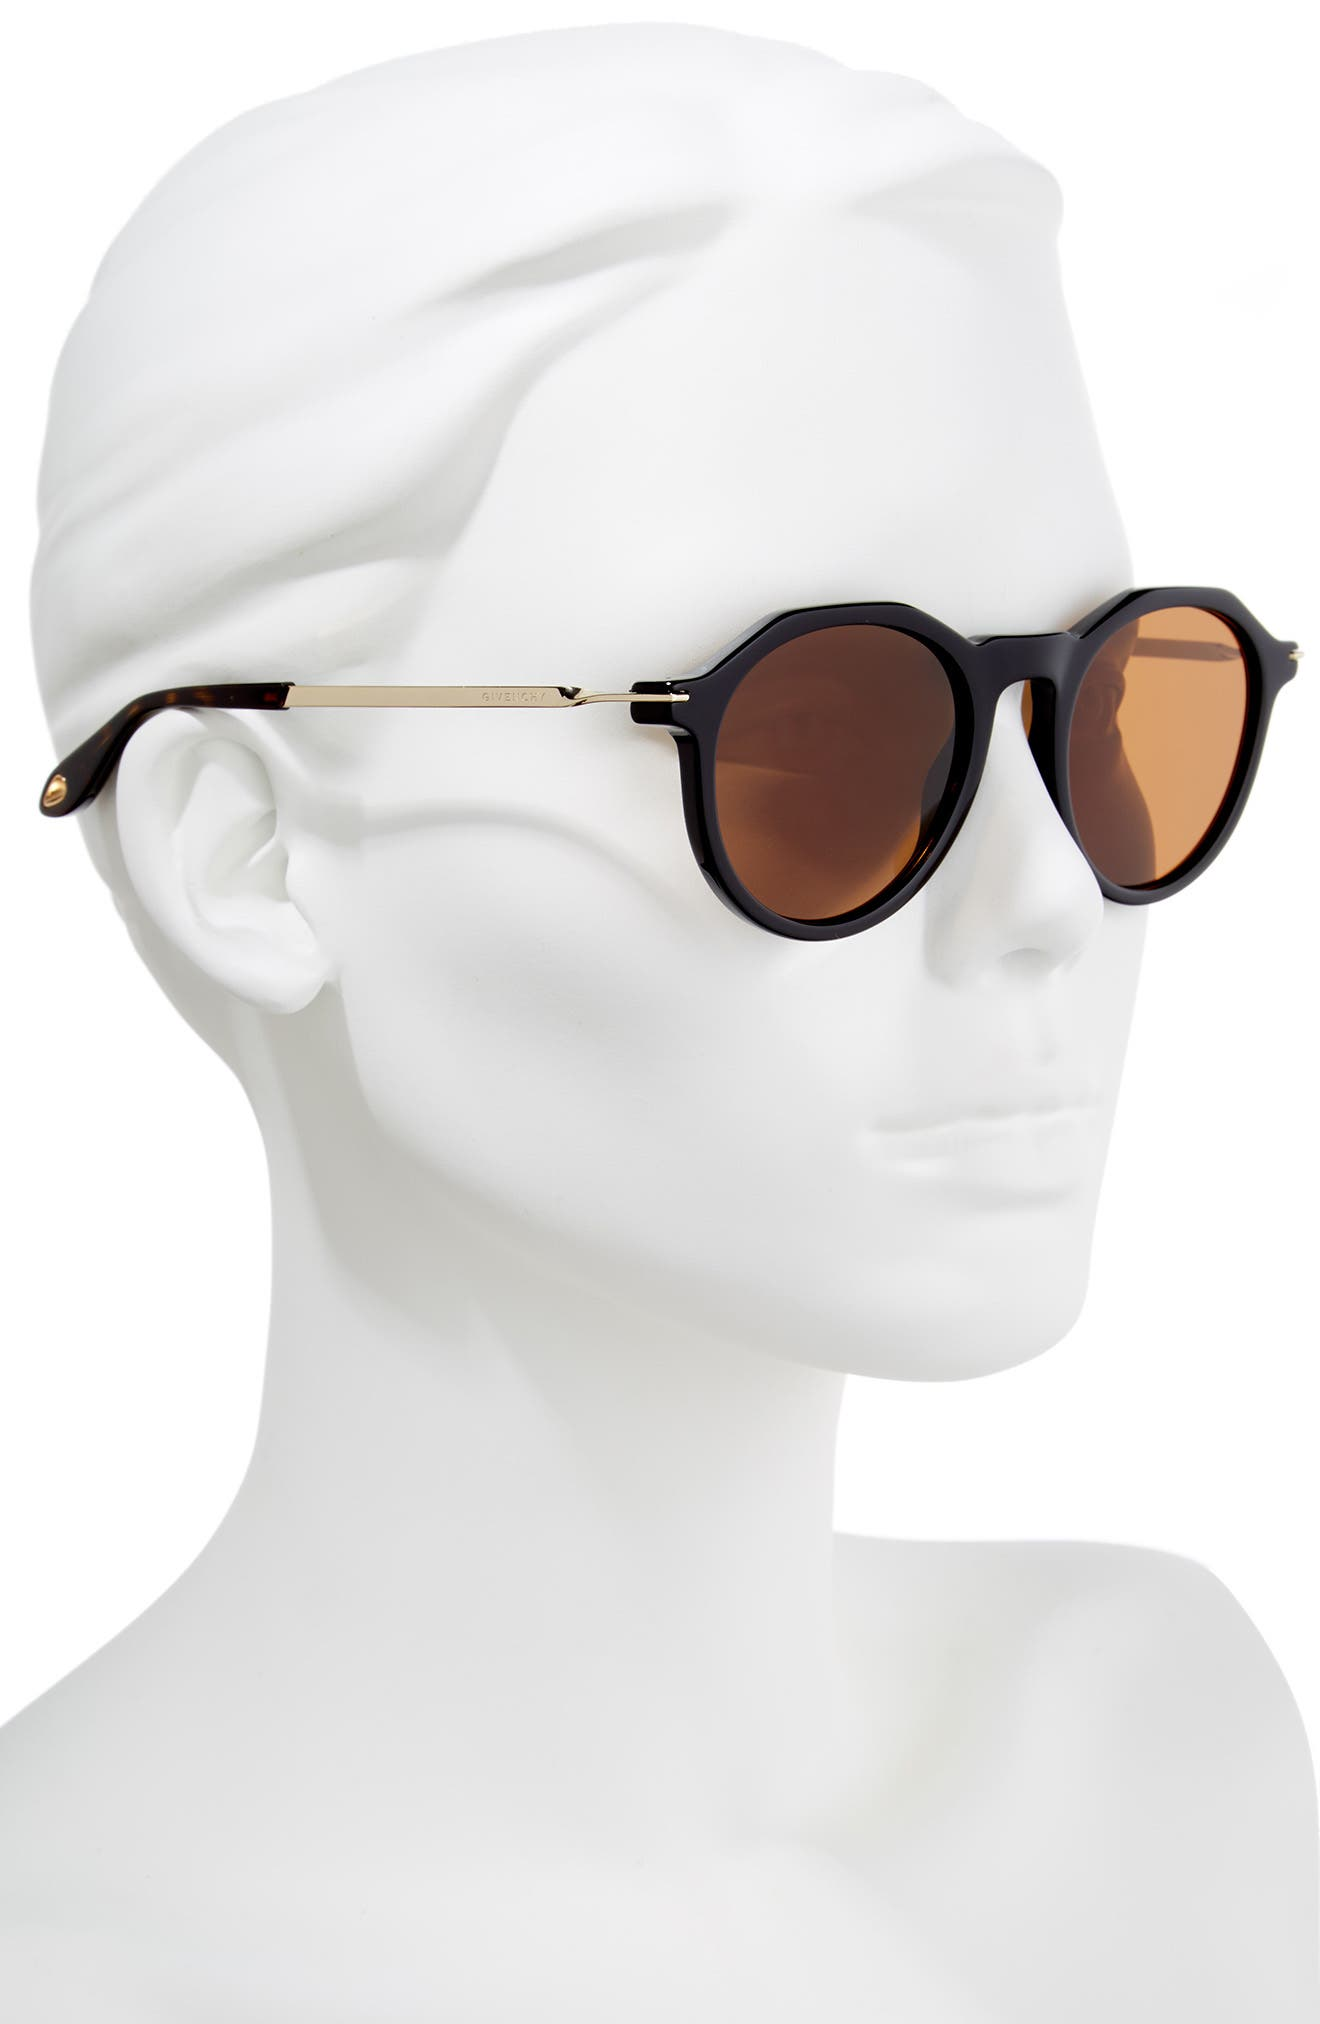 51mm Round Sunglasses,                             Alternate thumbnail 4, color,